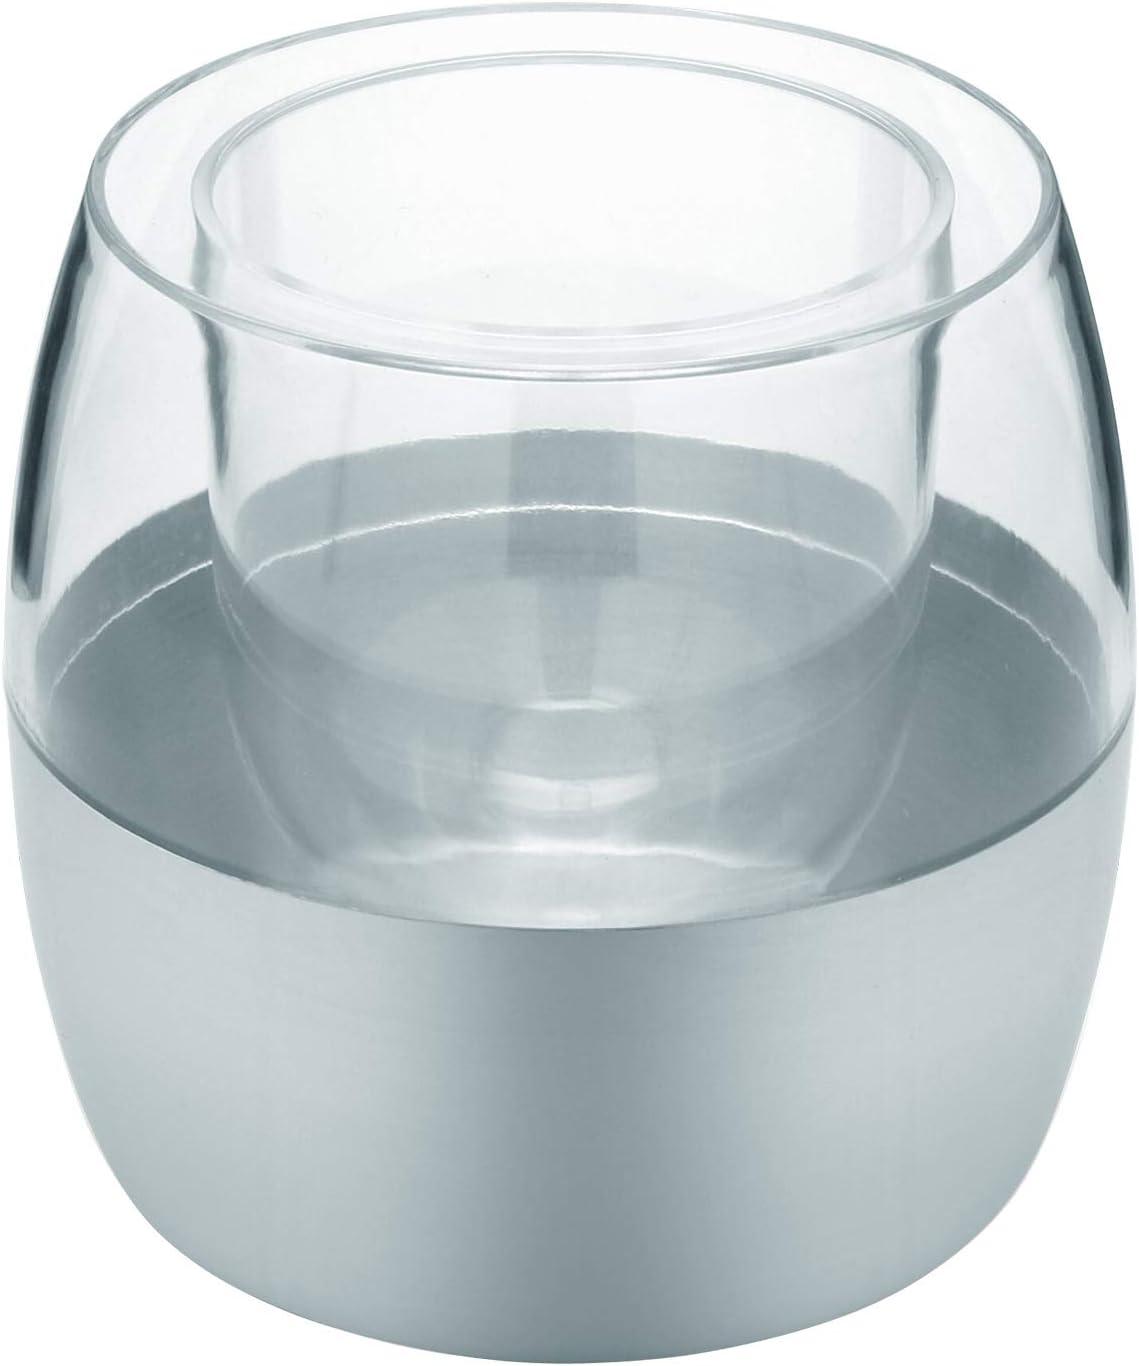 Sanwood Waterclou Brosse WC innovante en silicone sans poils avec manche en acier inoxydable et plastique Silicone Plastique Acier inoxydable bleu